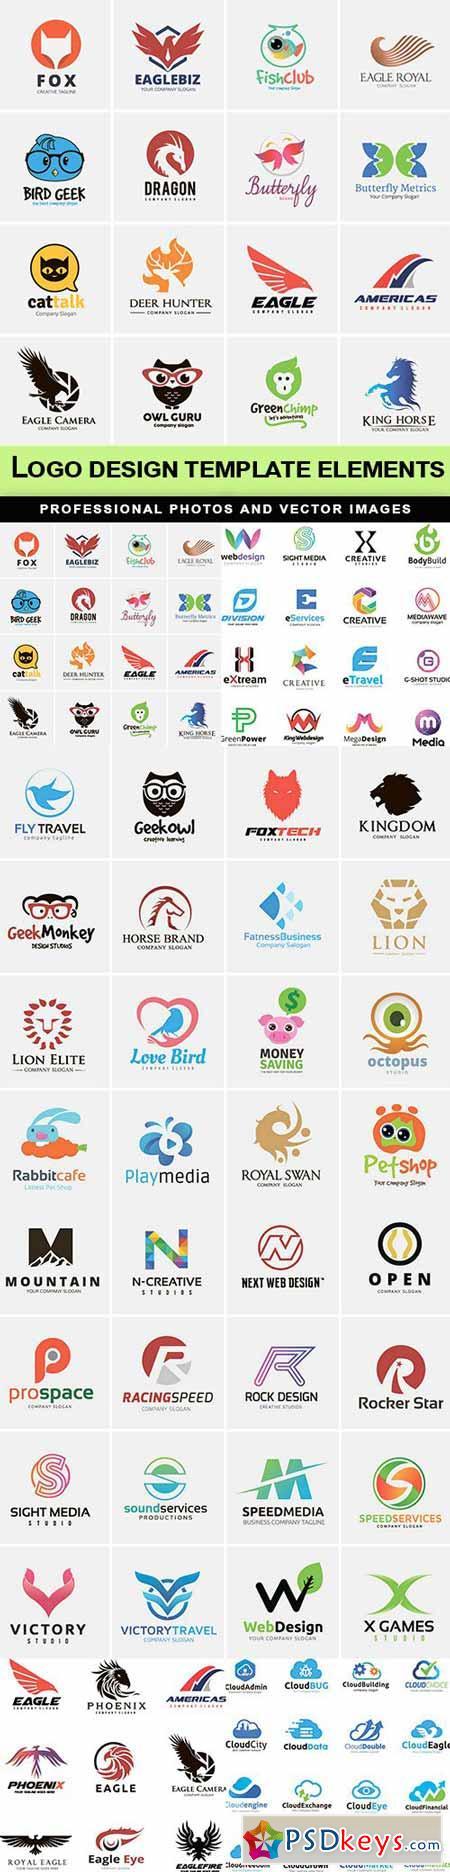 Logo design template elements - 6 EPS